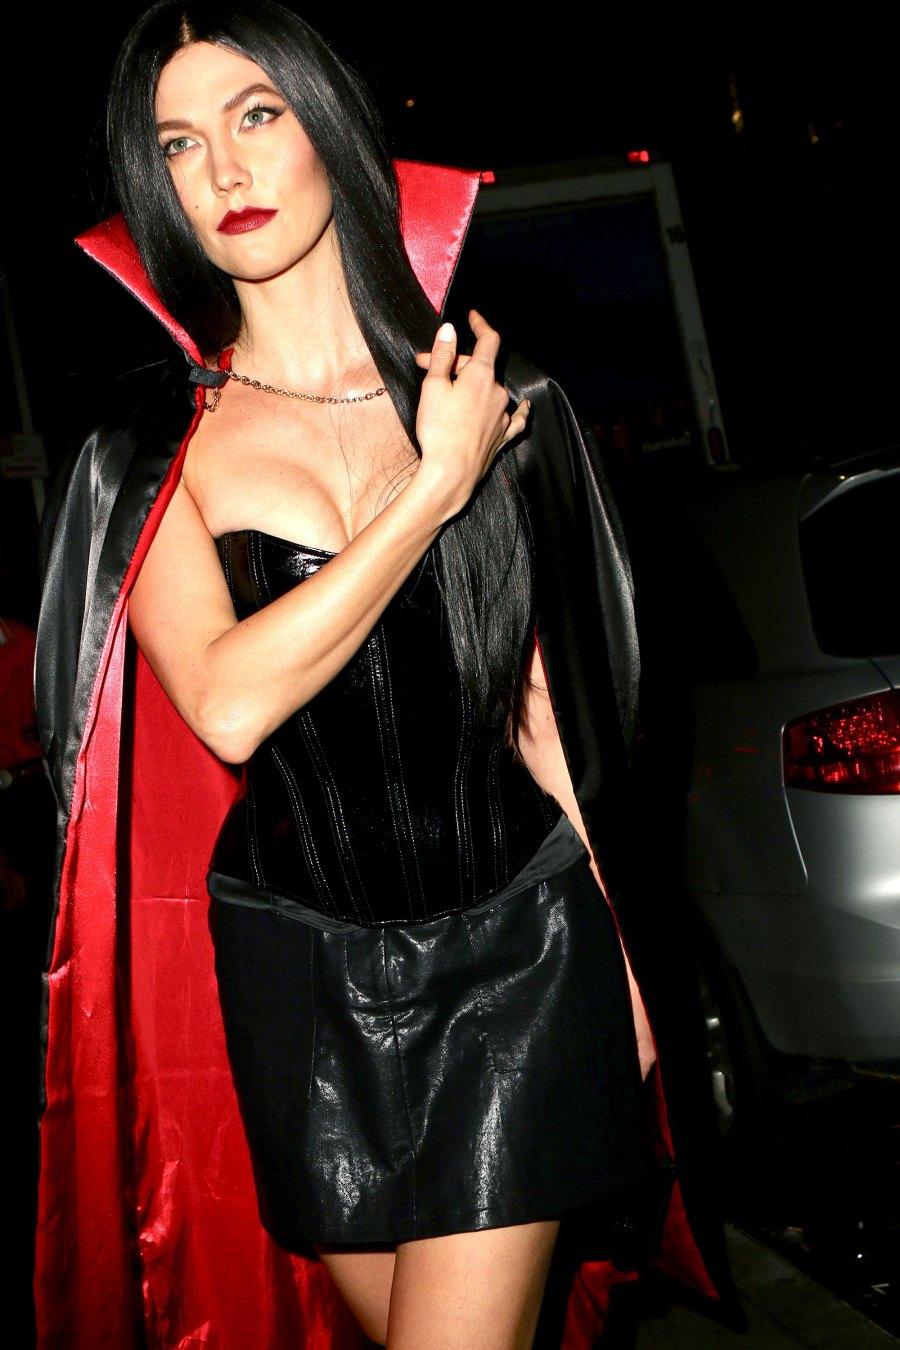 Celebs in Wigs Halloween Edition - Karlie Kloss